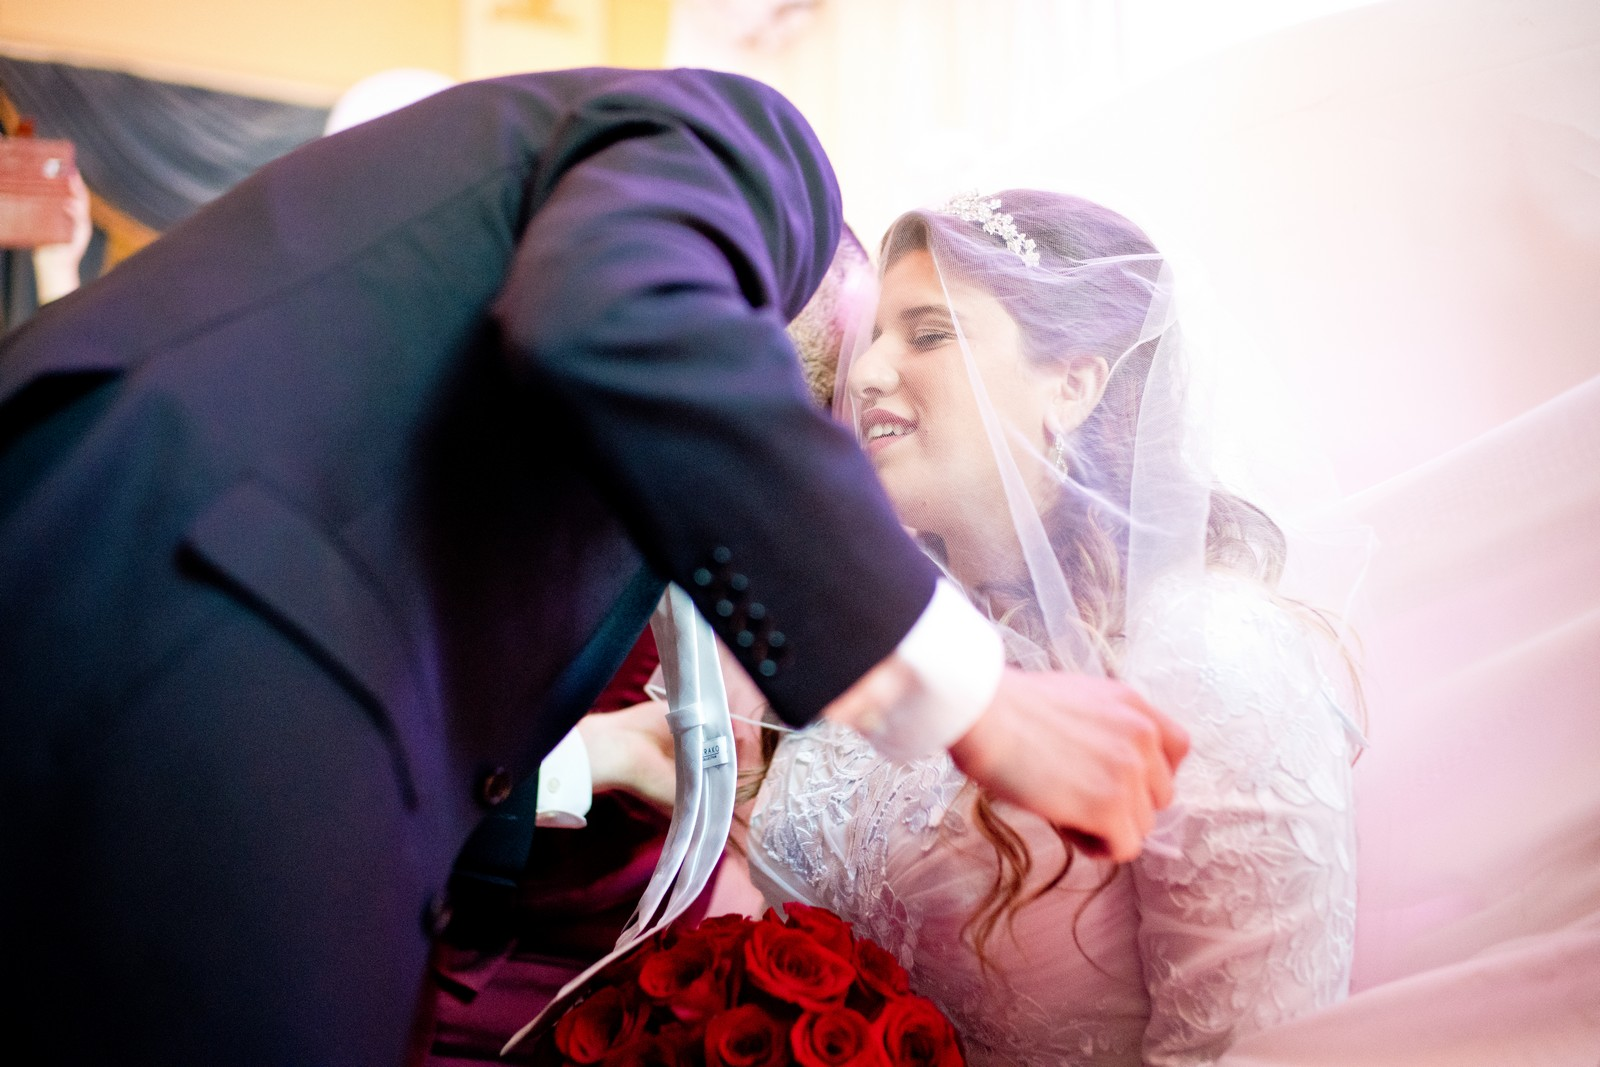 Orthodox Jewish Wedding, Dyker Beach Park and Golf Course, Brooklyn, New York, Photo by Chaim Schvarcz, Badeken, Bdeken, Bride, Groom